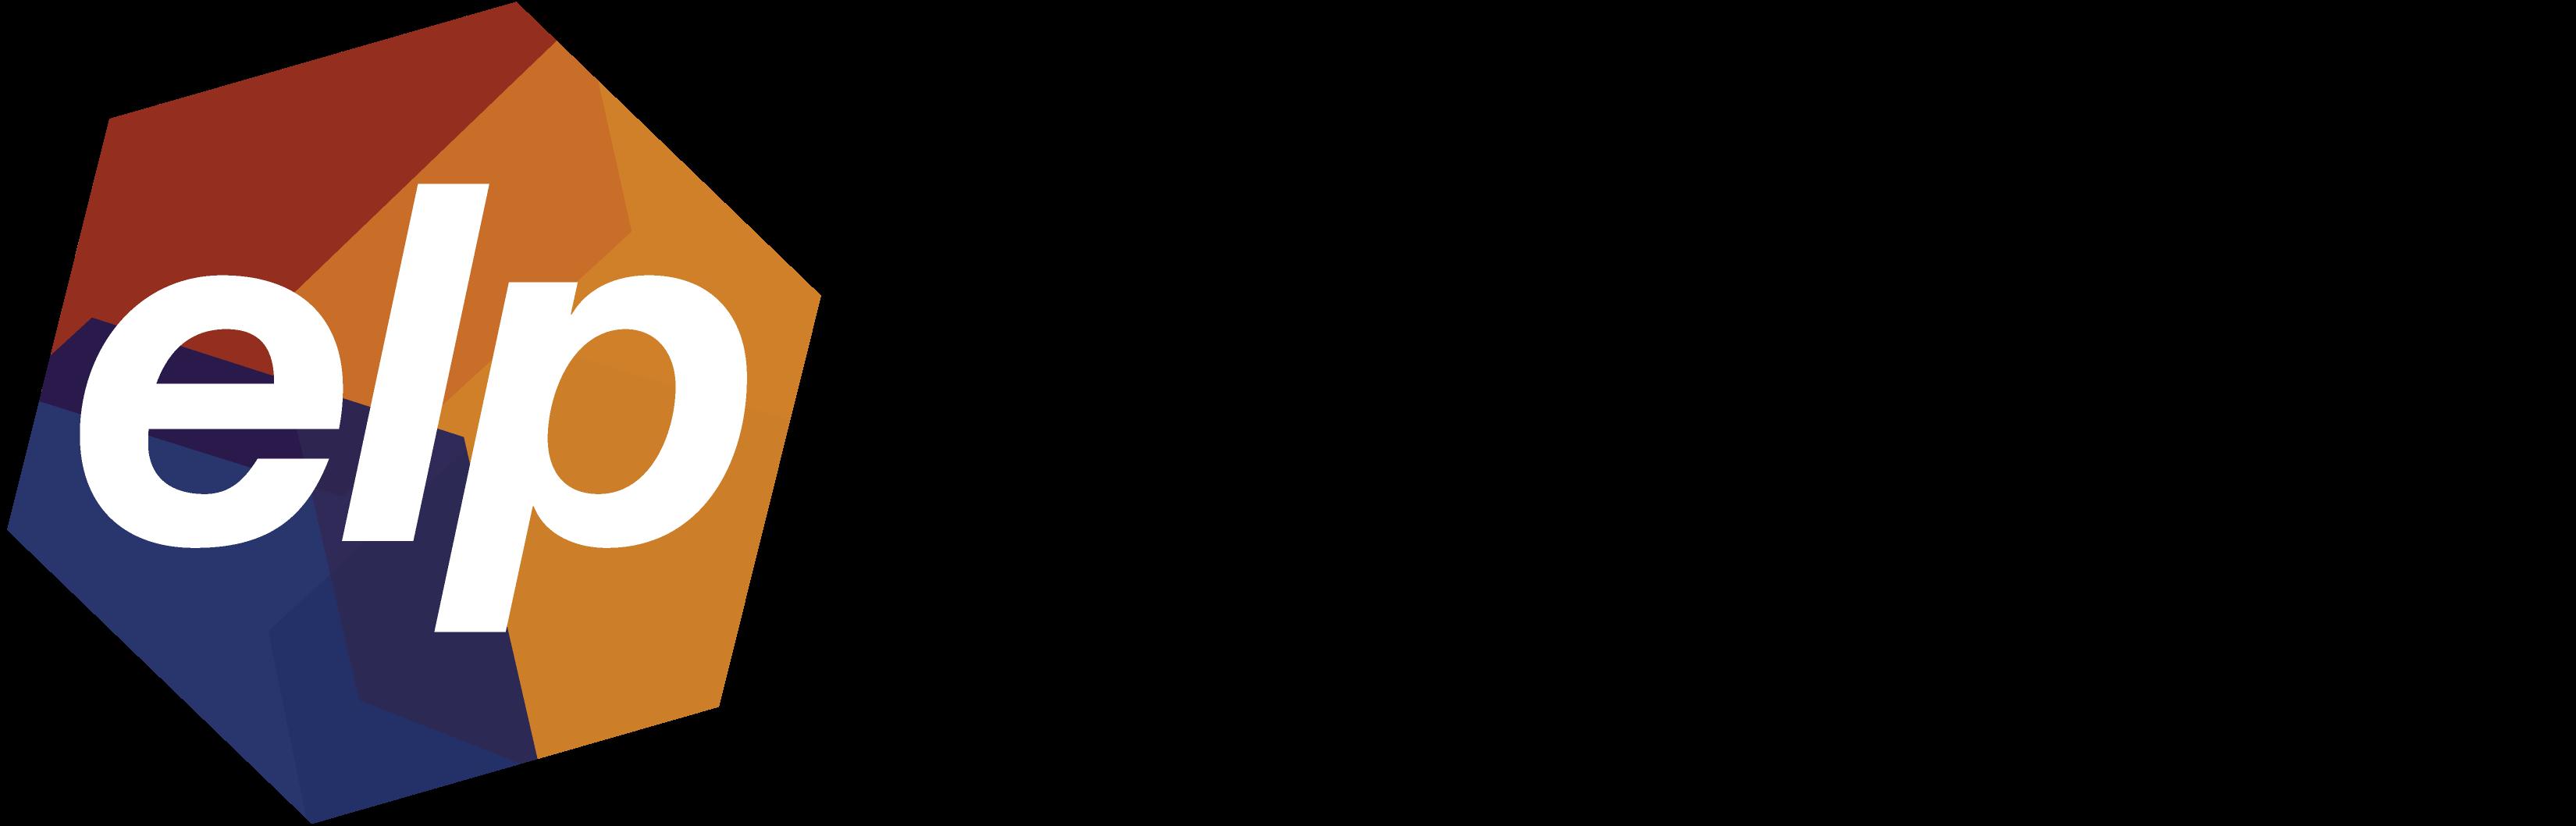 Dave Ramsey ELP logo